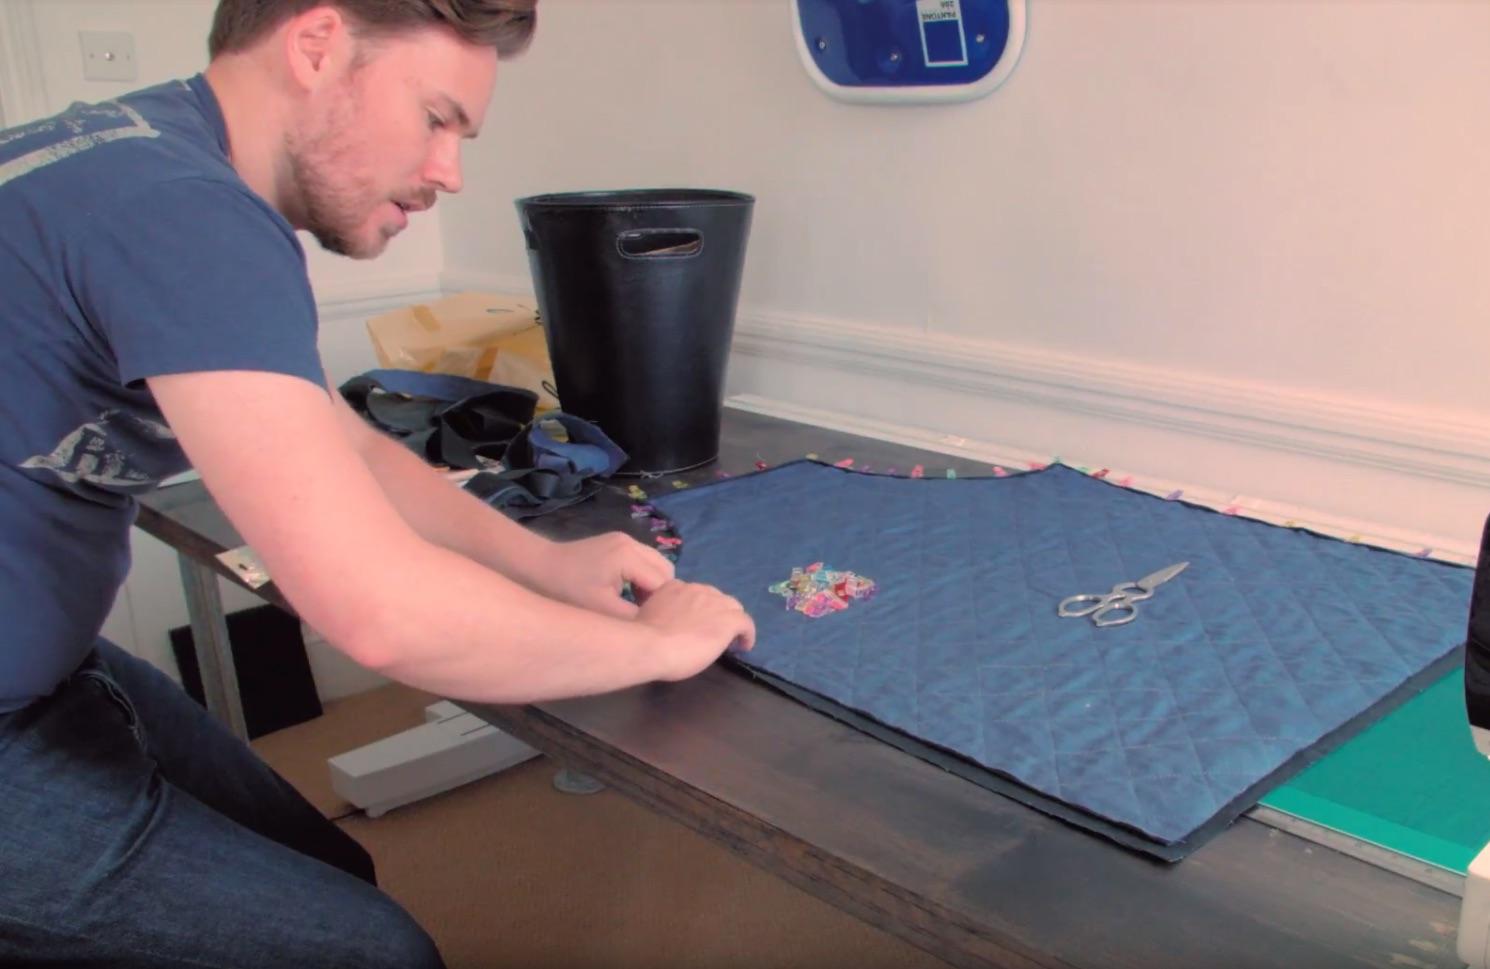 Weekend Watch: Handy-Making and Homebrew at Malt & Make